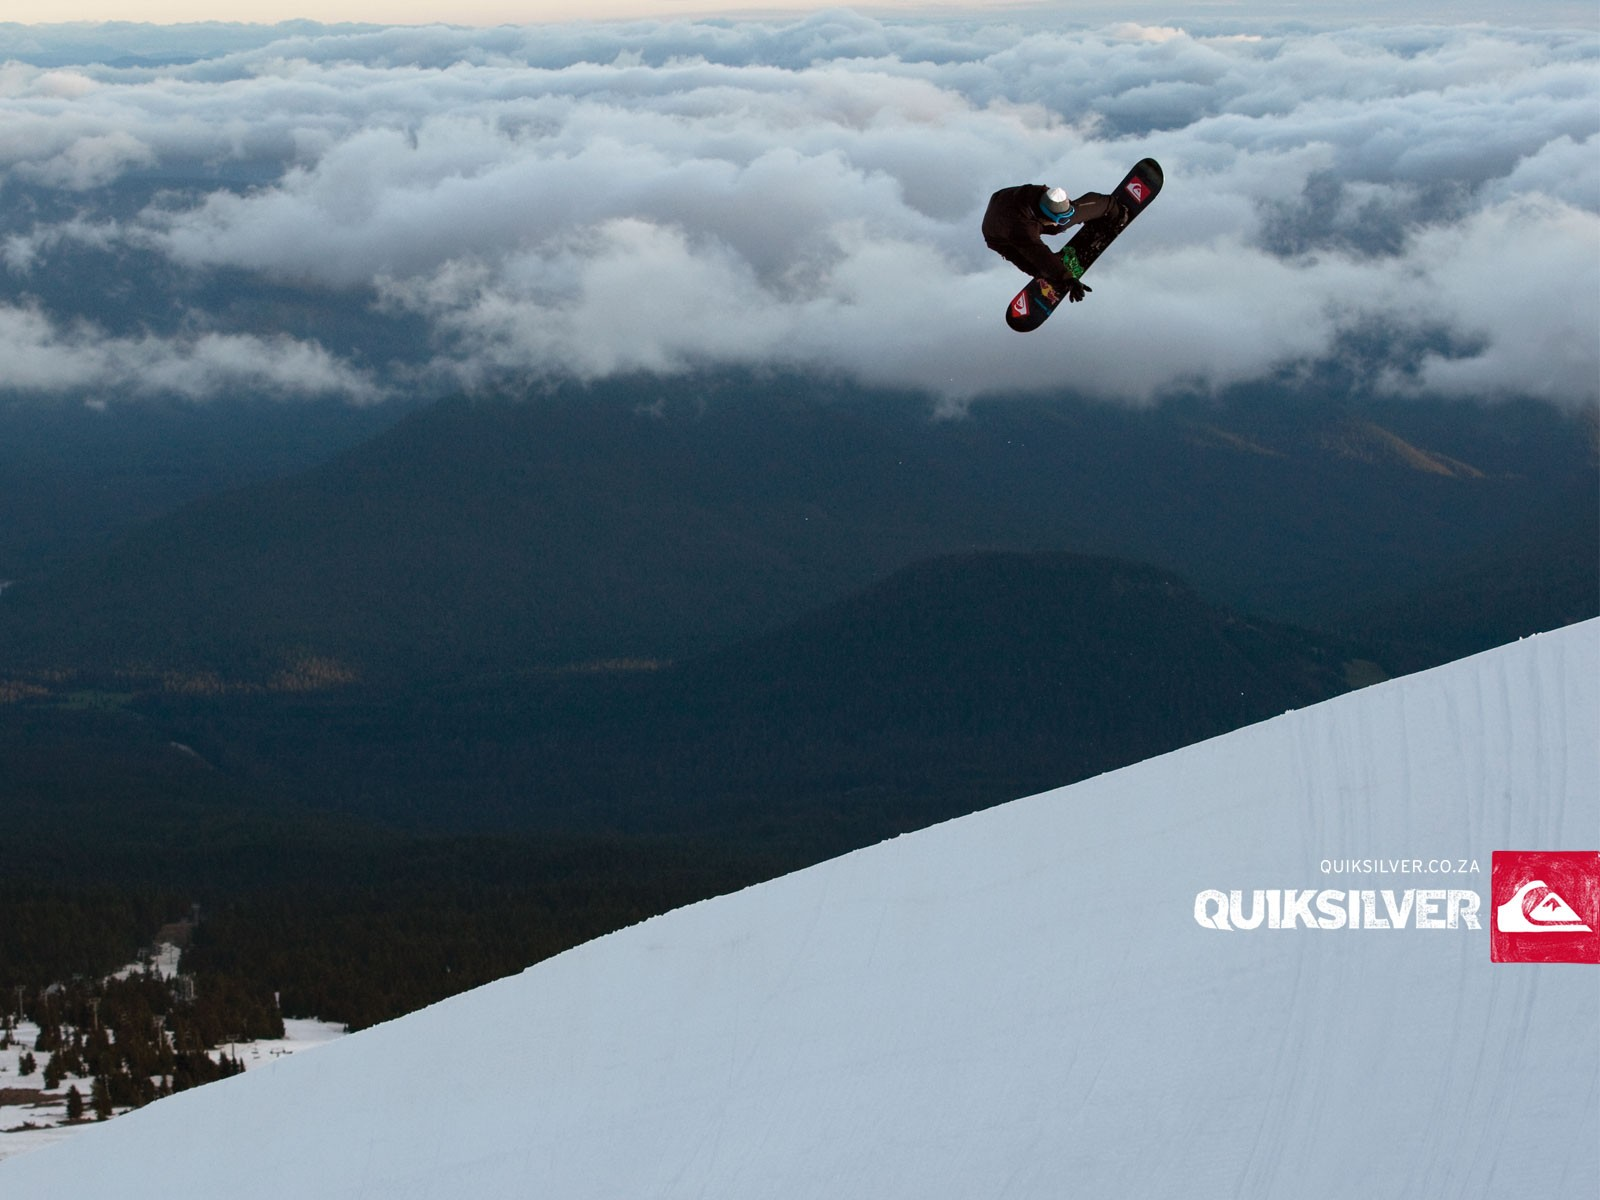 snow snowboarding quiksilver wallpaper 1600x1200